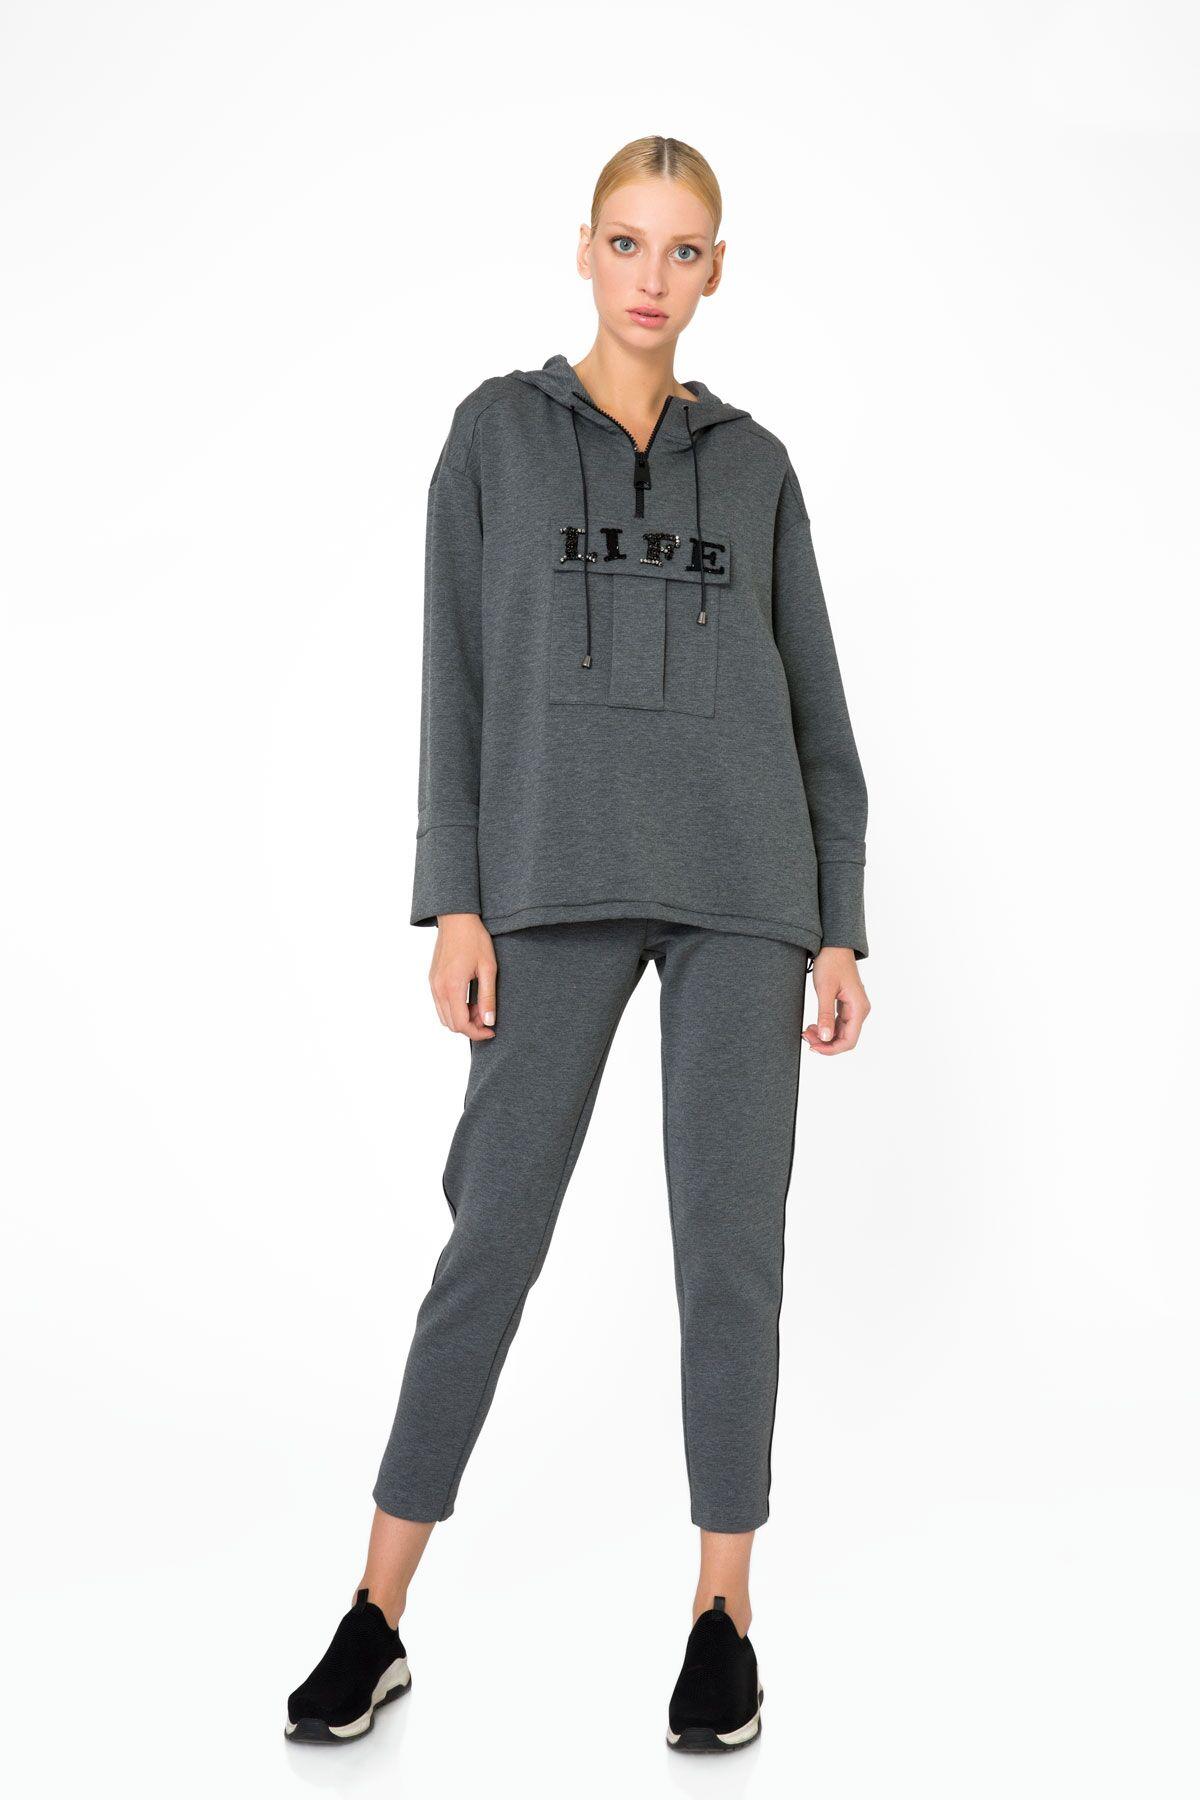 Pocket Detailed Hooded Gray Sweatshirt